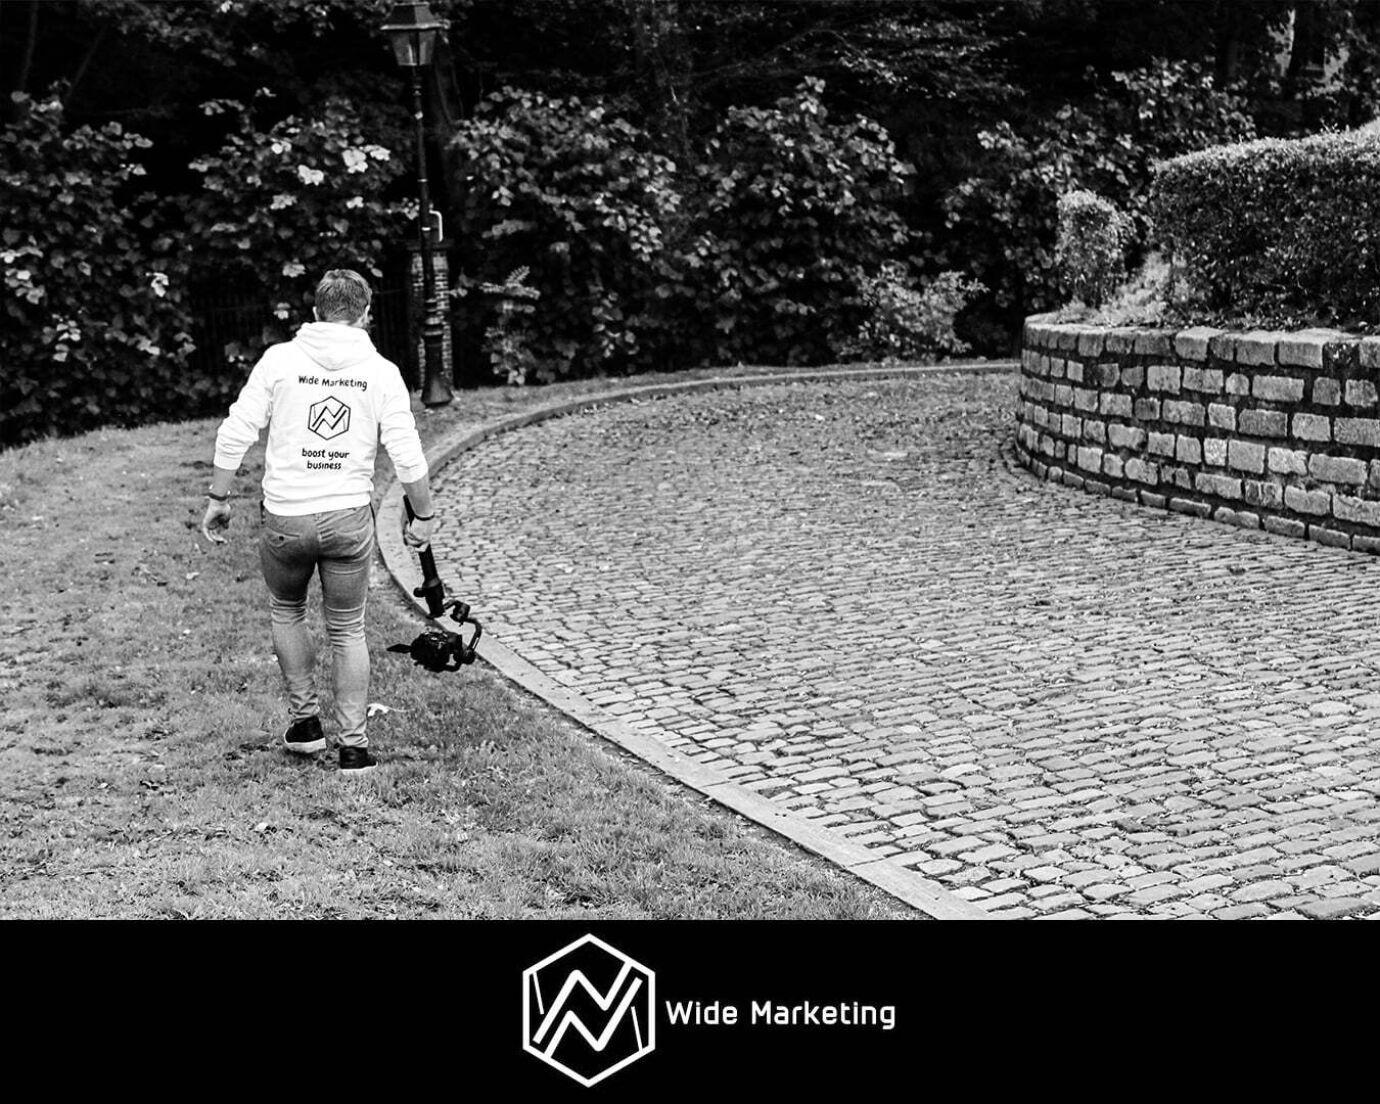 Wide marketing